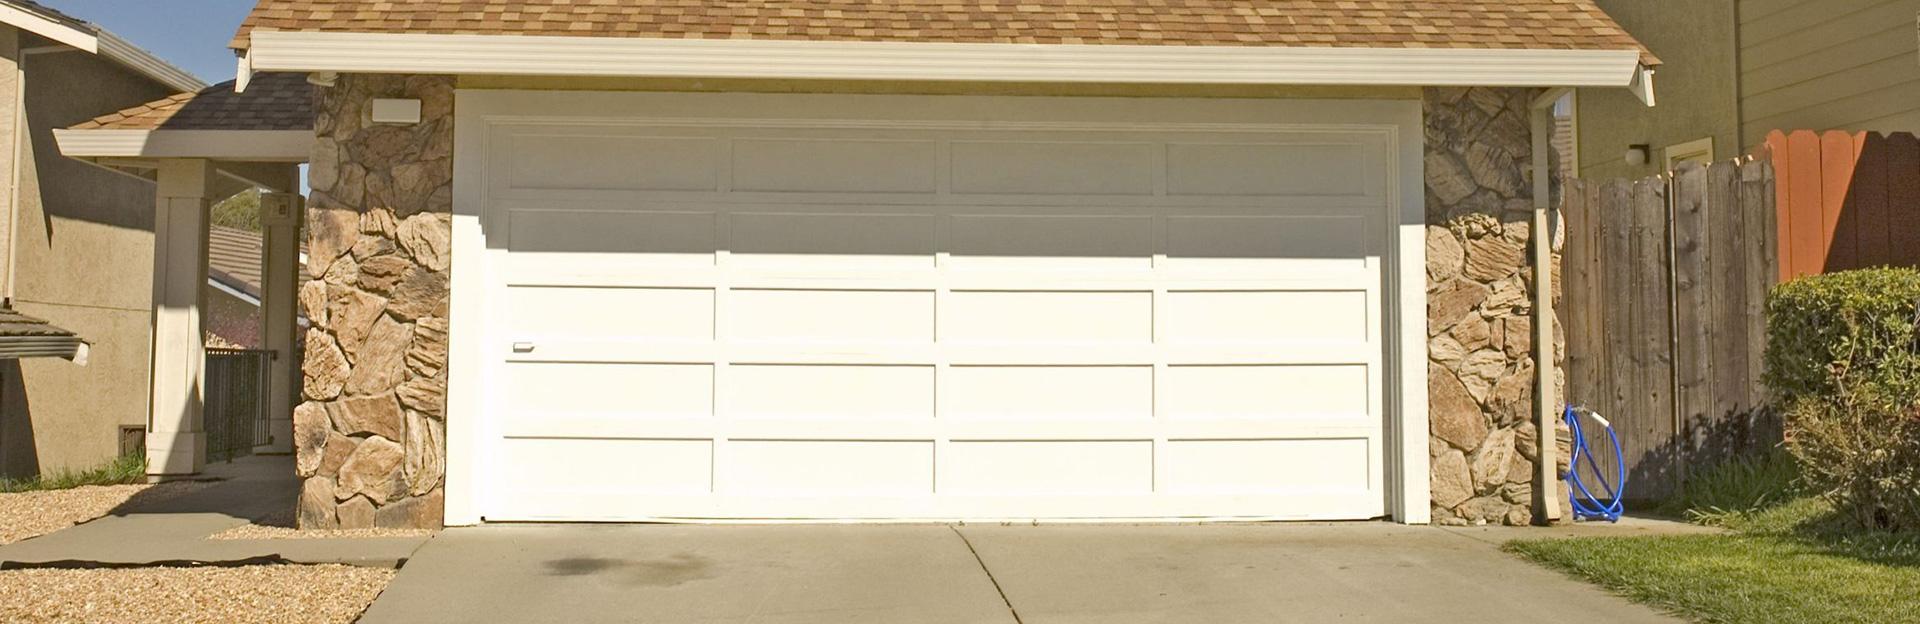 pose porte de garage menuisier dunkerque menuiserie ext rieure. Black Bedroom Furniture Sets. Home Design Ideas